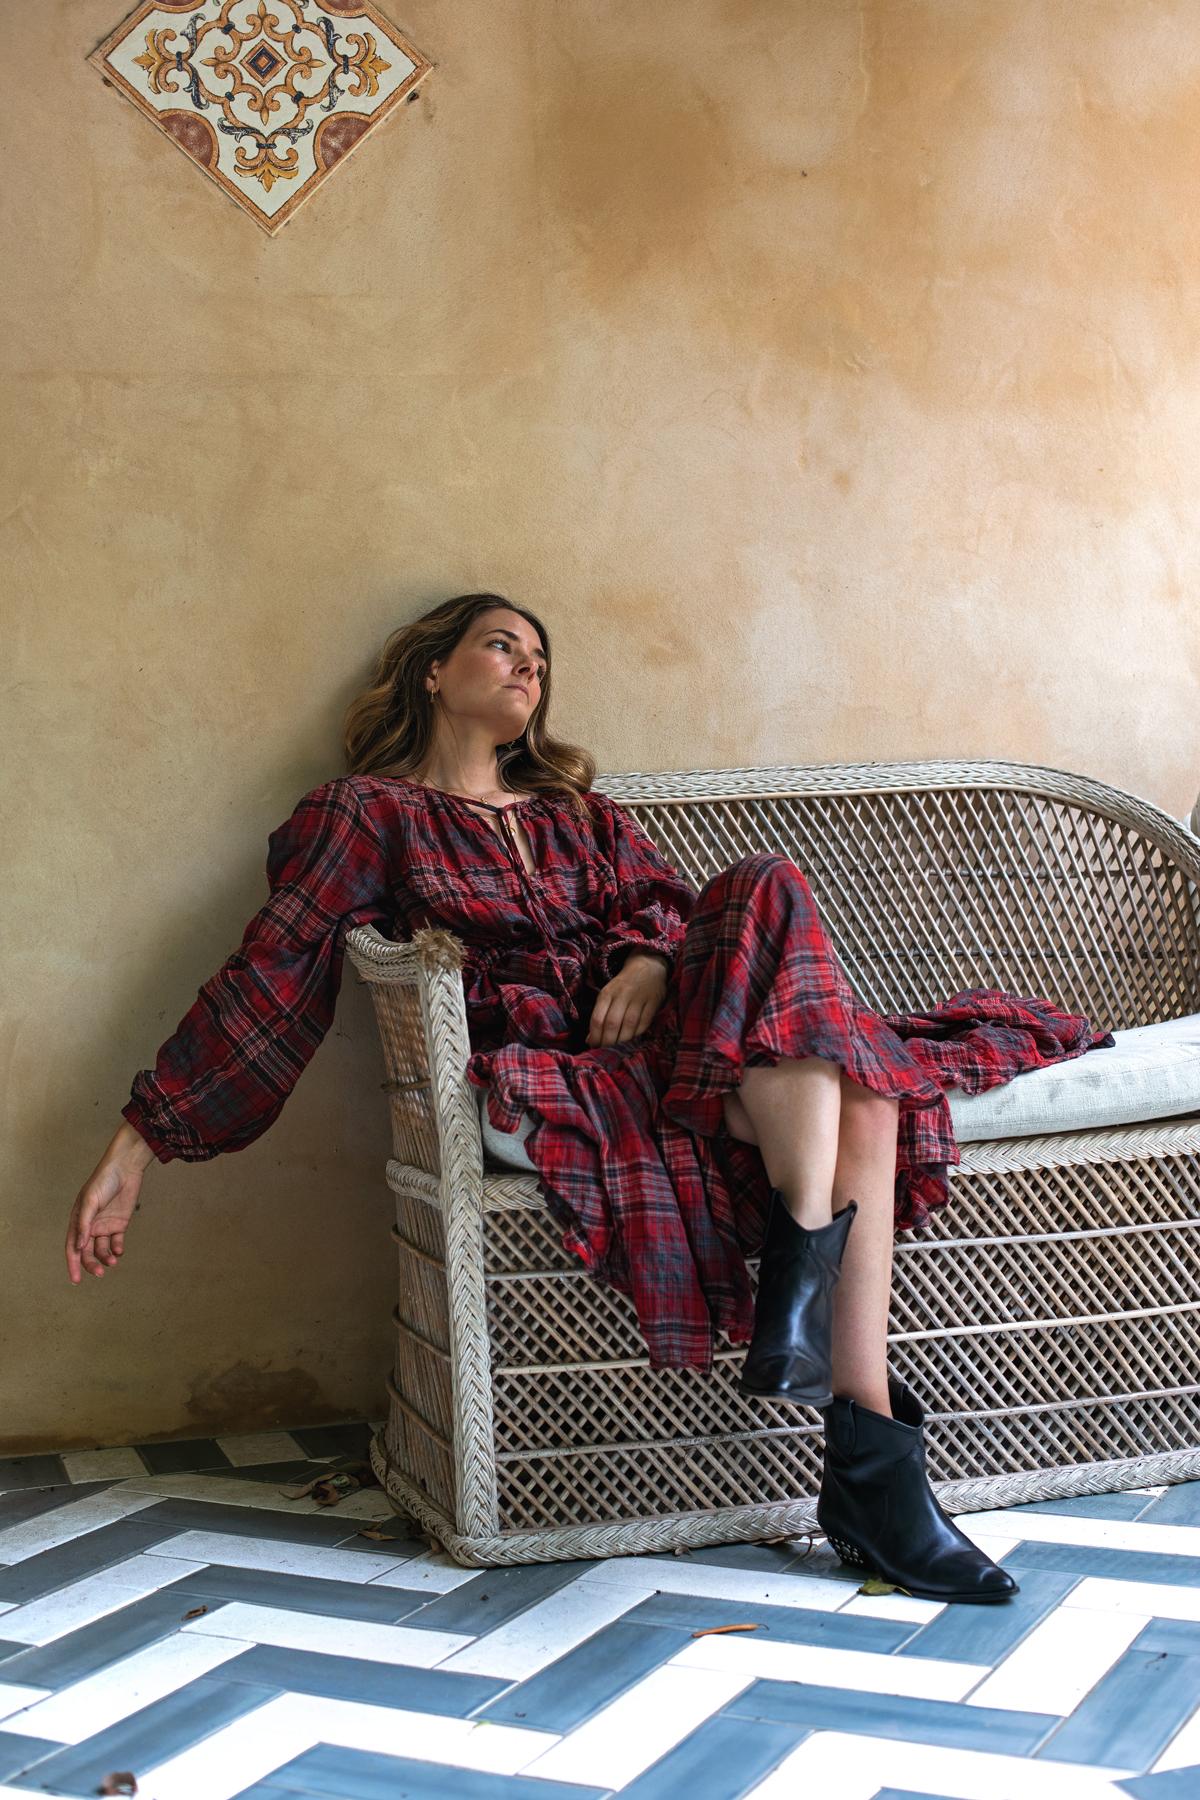 Bohemian Traders FIESTA MIDI DRESS IN BARBADOS CHERRY PLAID worn by Inspiring Wit fashion blogger Jenelle